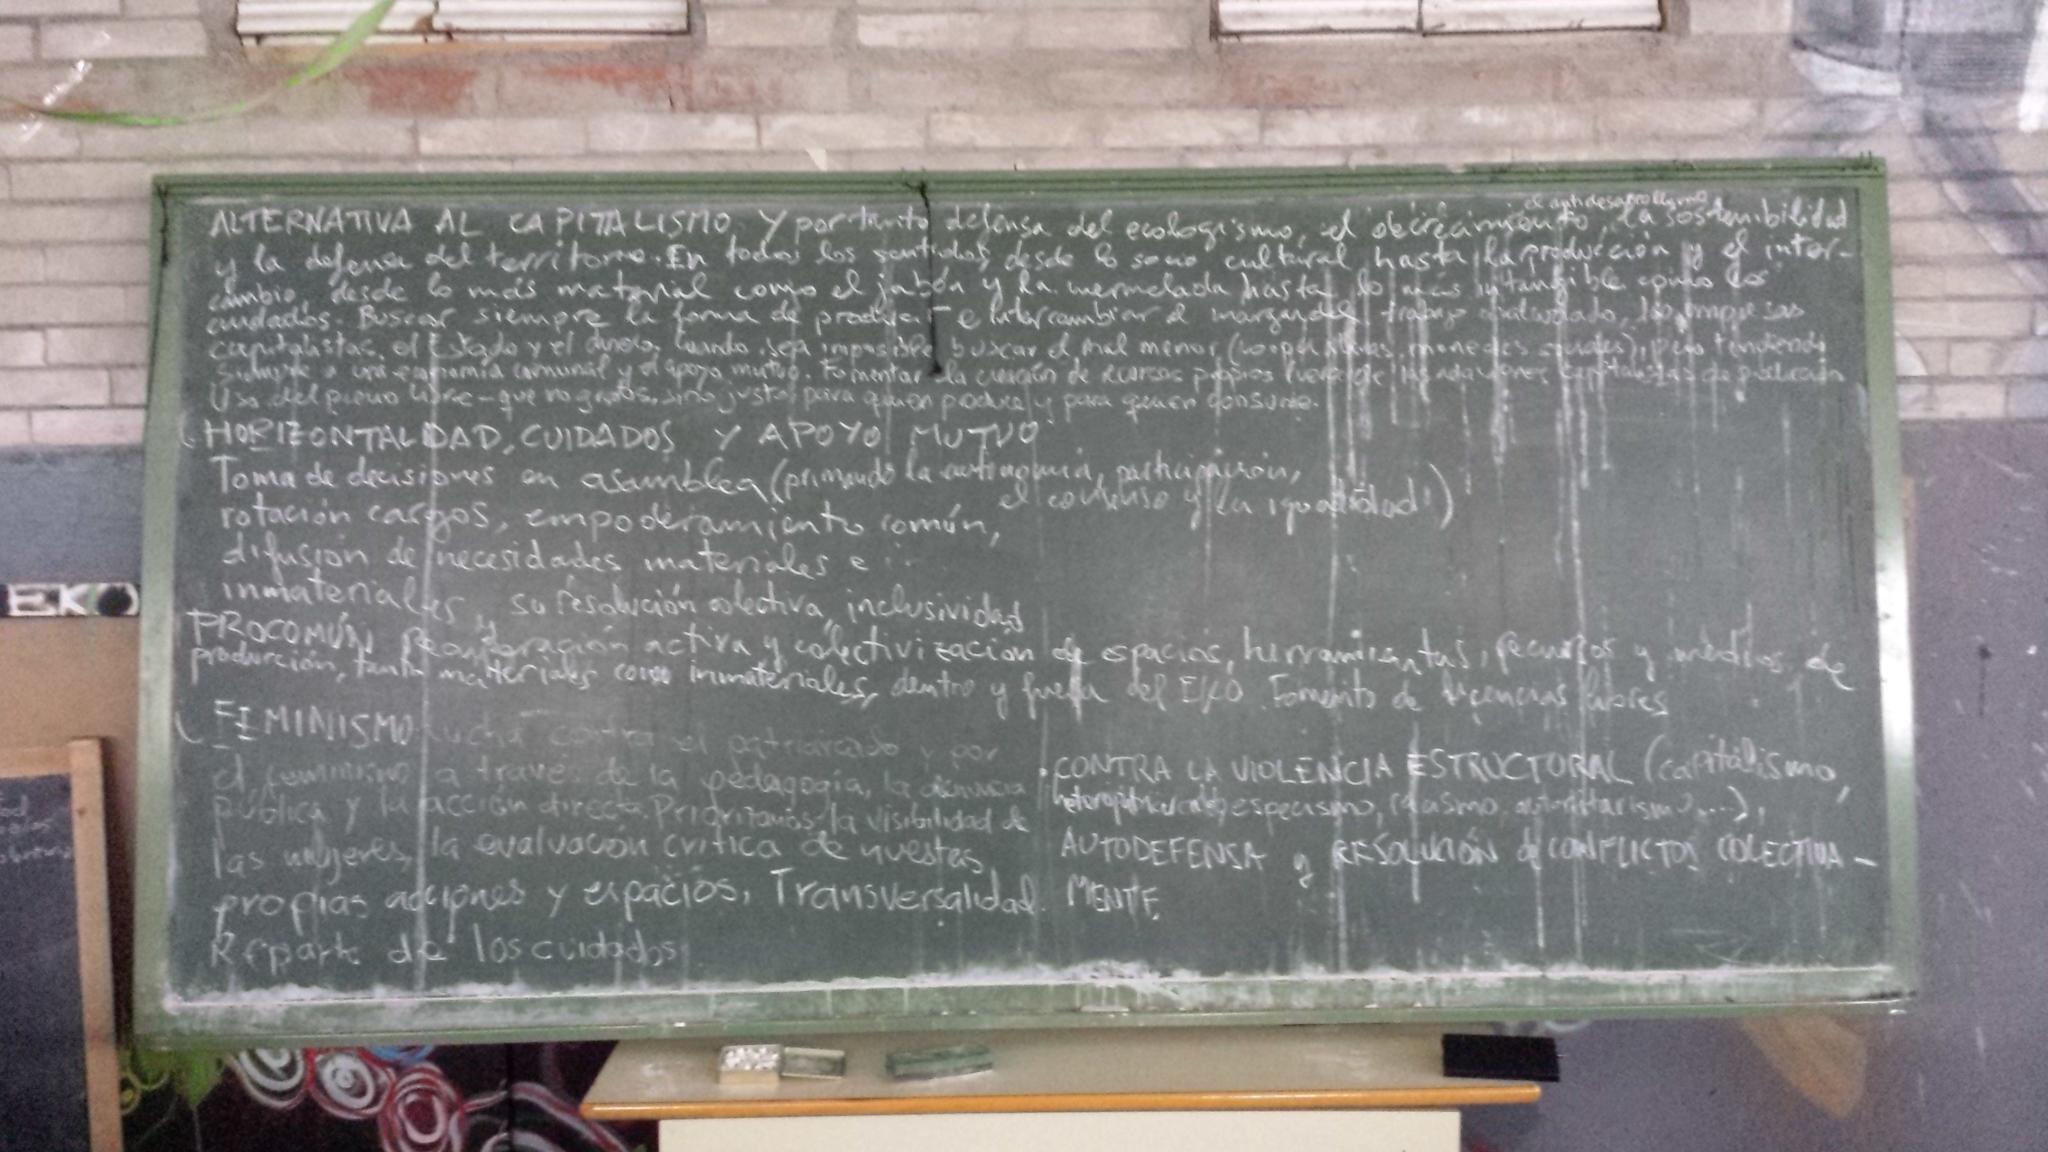 Principios Eko - Febrero 2016